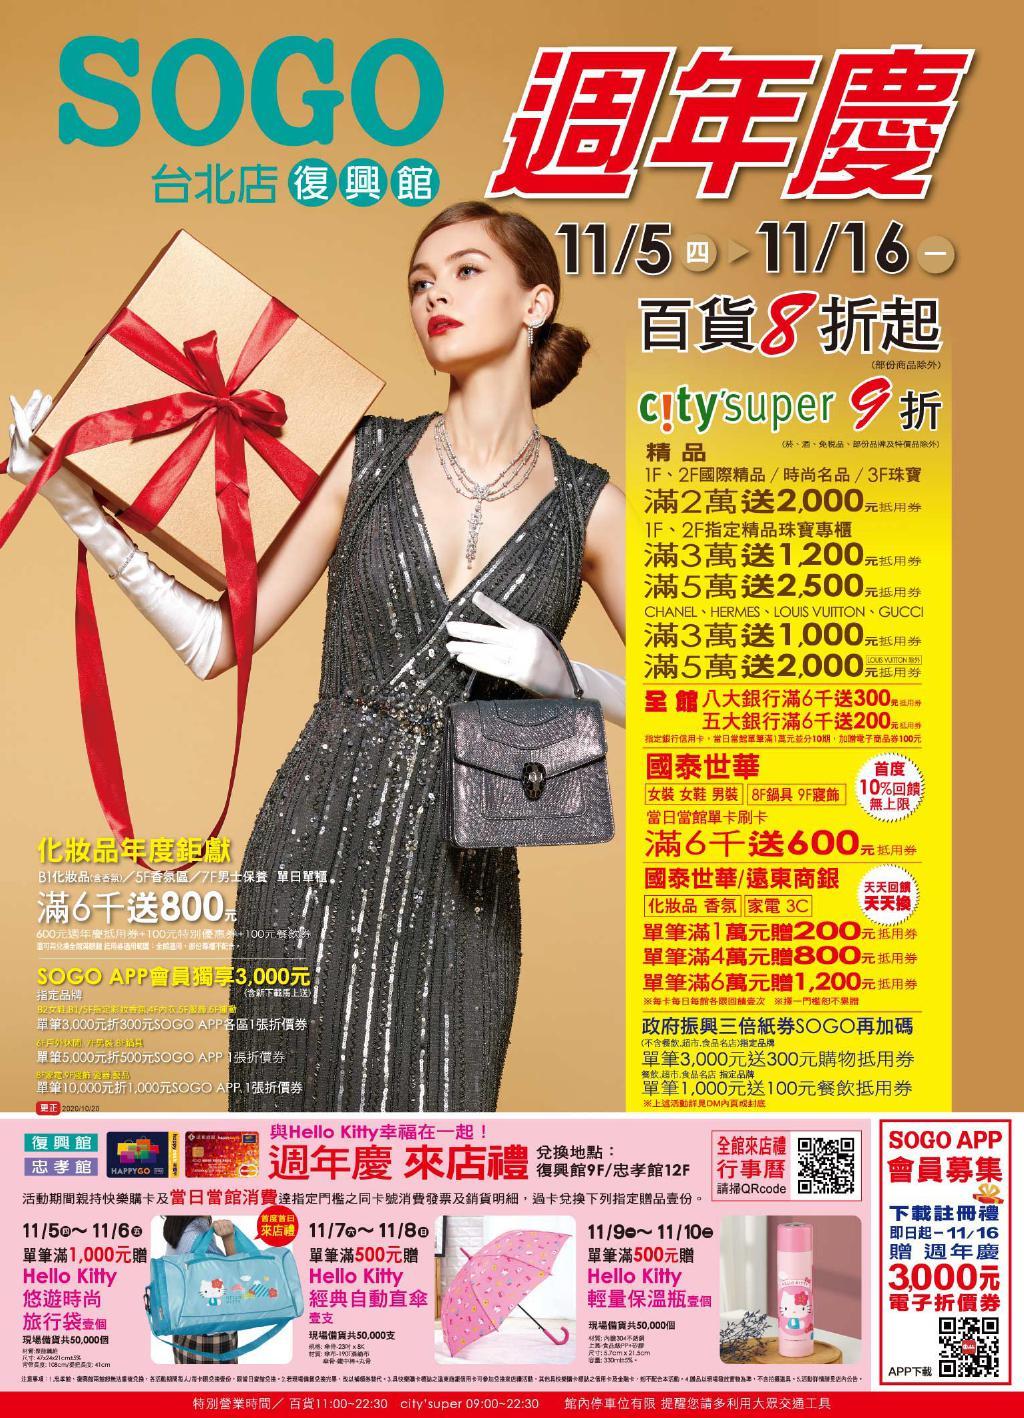 SOGO《台北復興館》「週年慶 百貨8折起 city'super9折」 【2020/11/16 止】